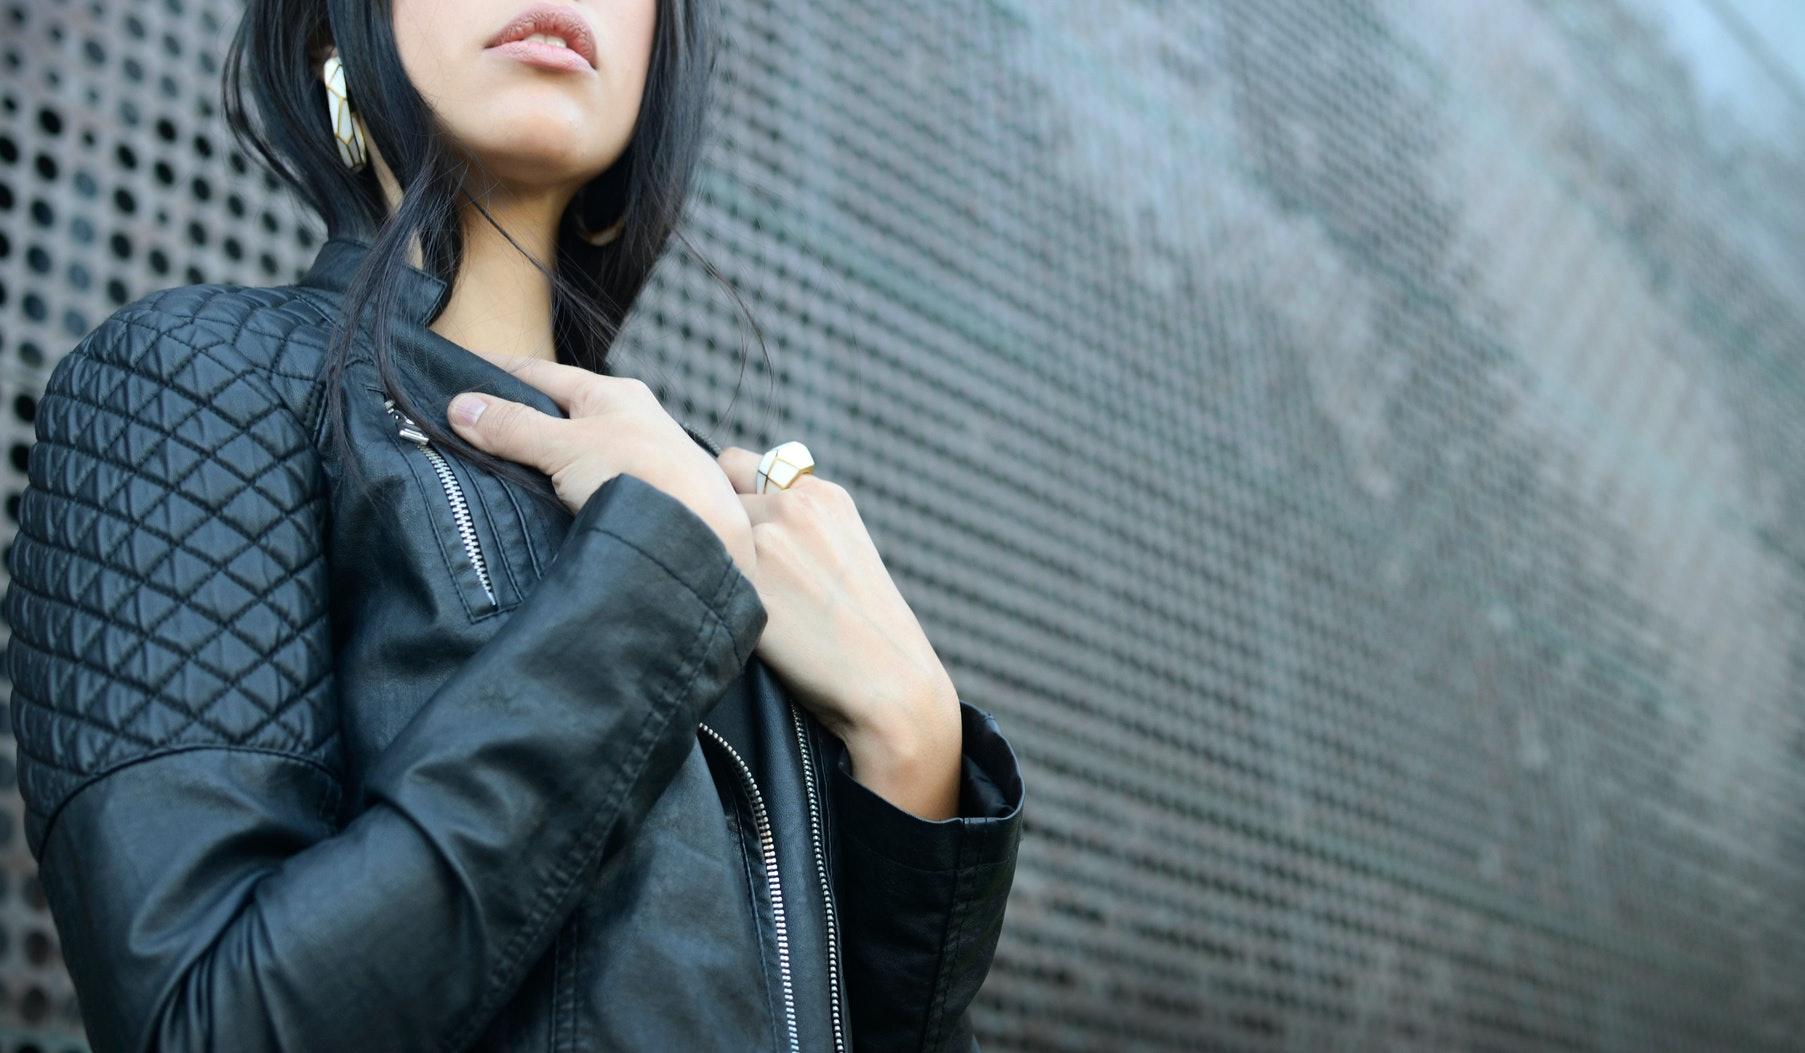 RACHEL Ladies Leather Jacket Cherry Classic Fashion Real Leather Jacket